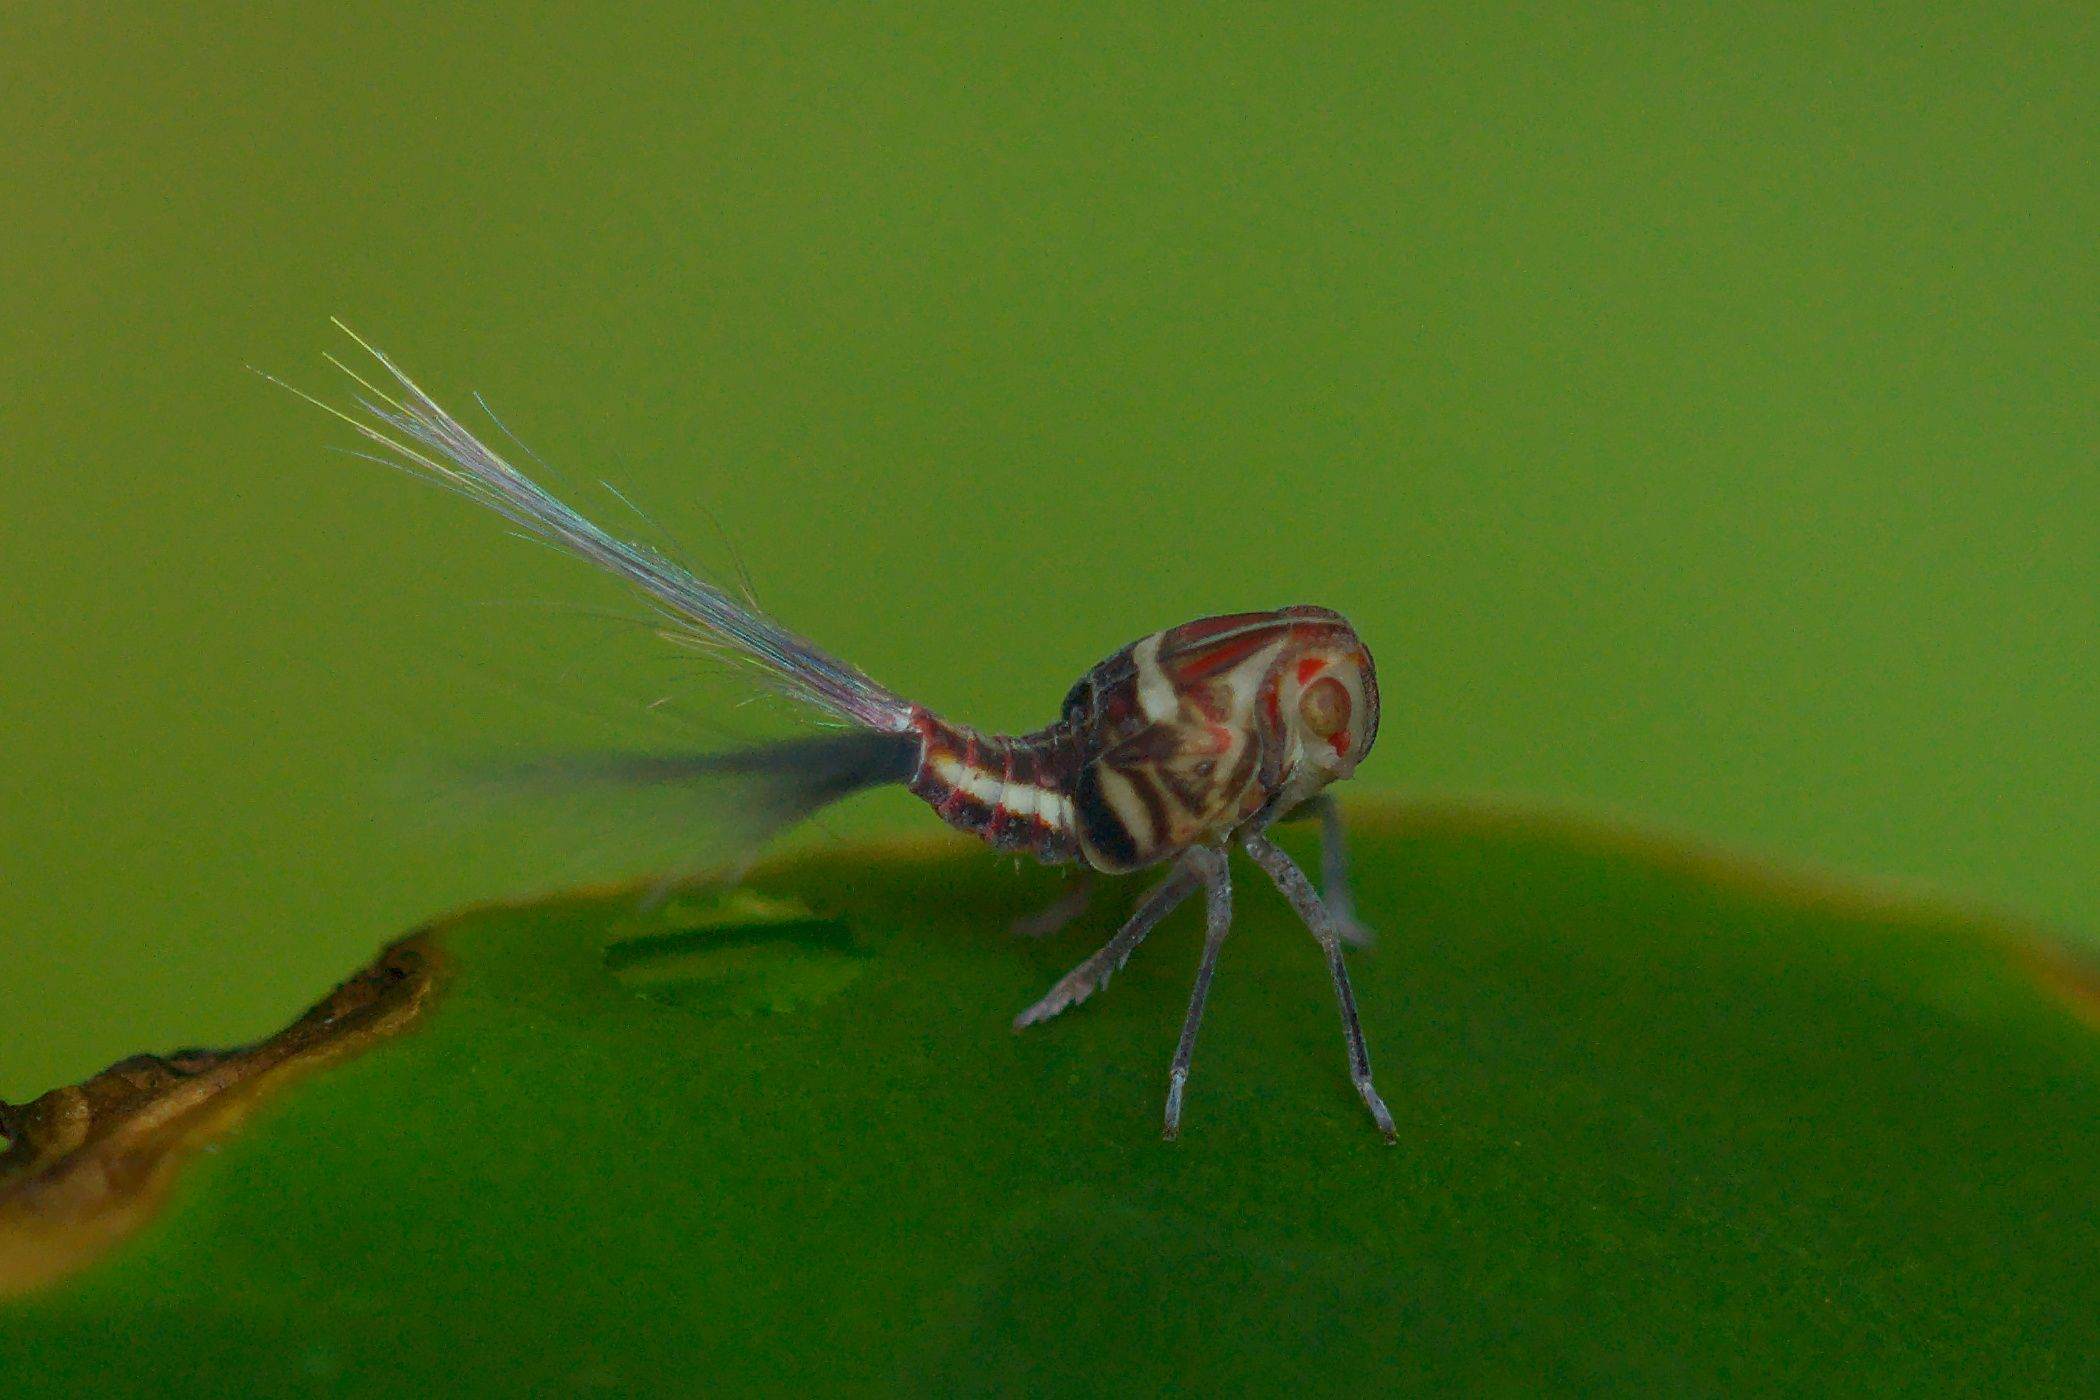 "<a href=""/nogodinidae-sp-costa-rica"" target=""_blank"" rel=""noopener noreferrer"">Nogodinidae sp. (Zikade)</a>"